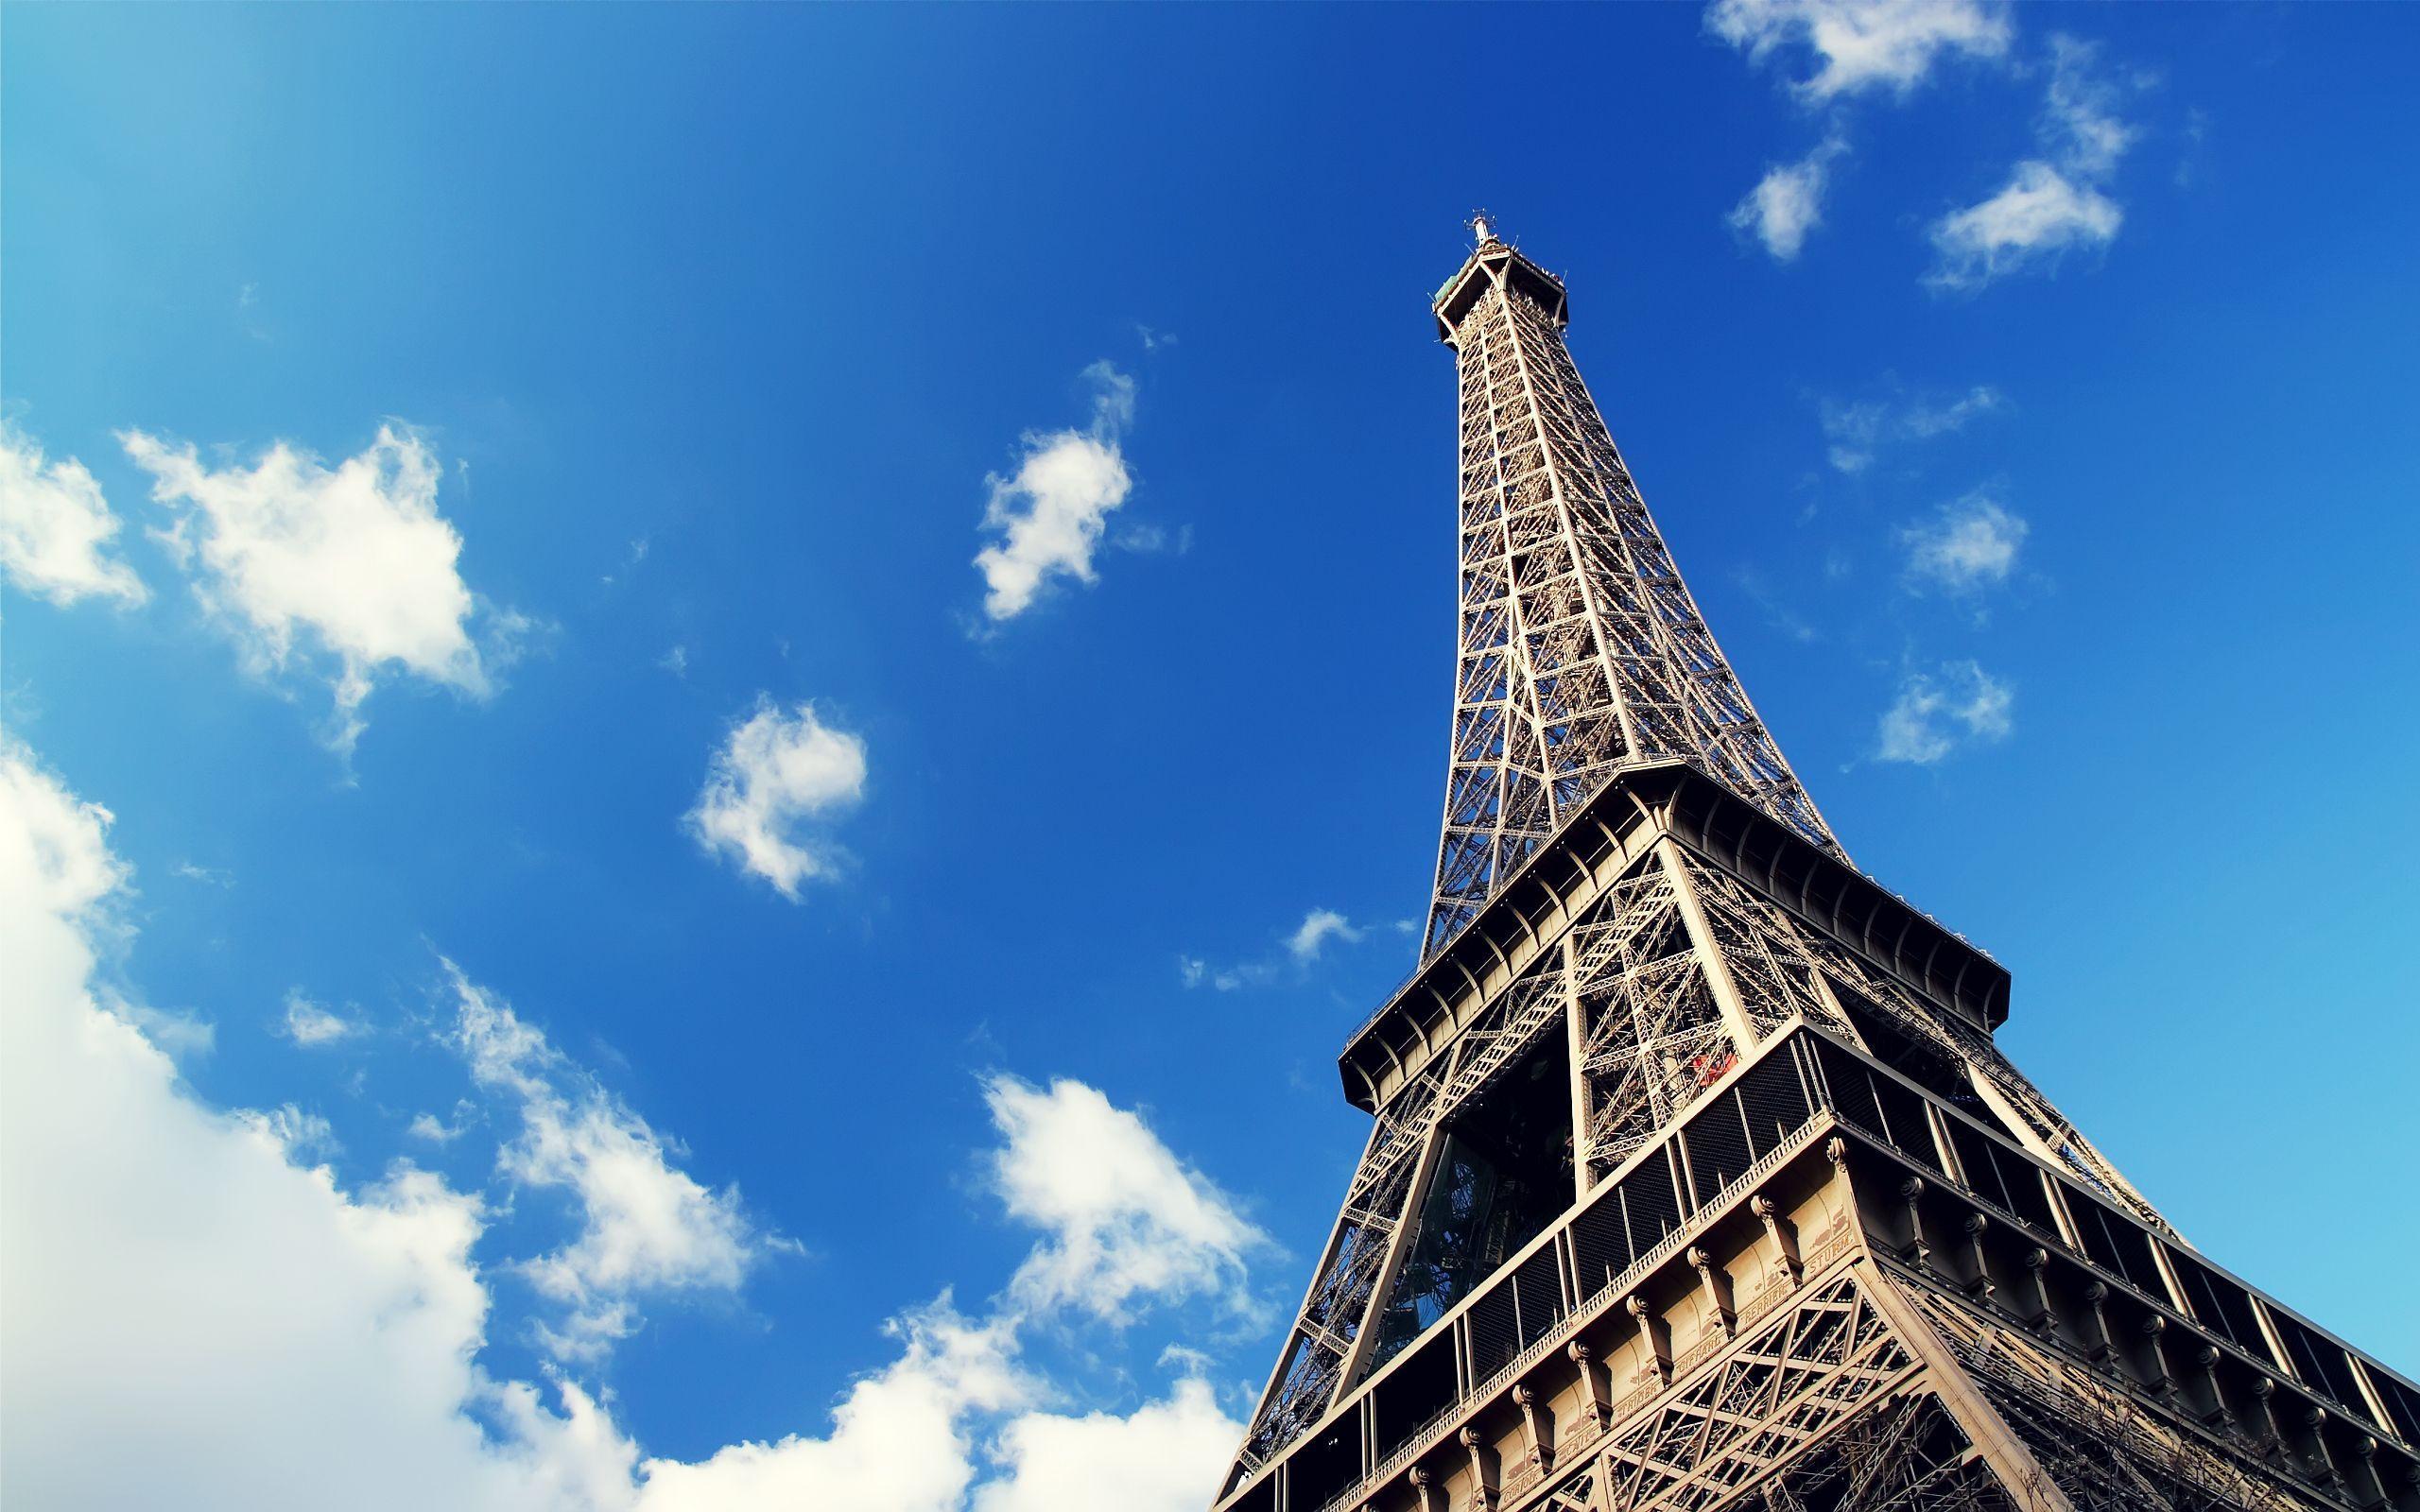 eiffel tower paris wallpaper hd desktop background travel